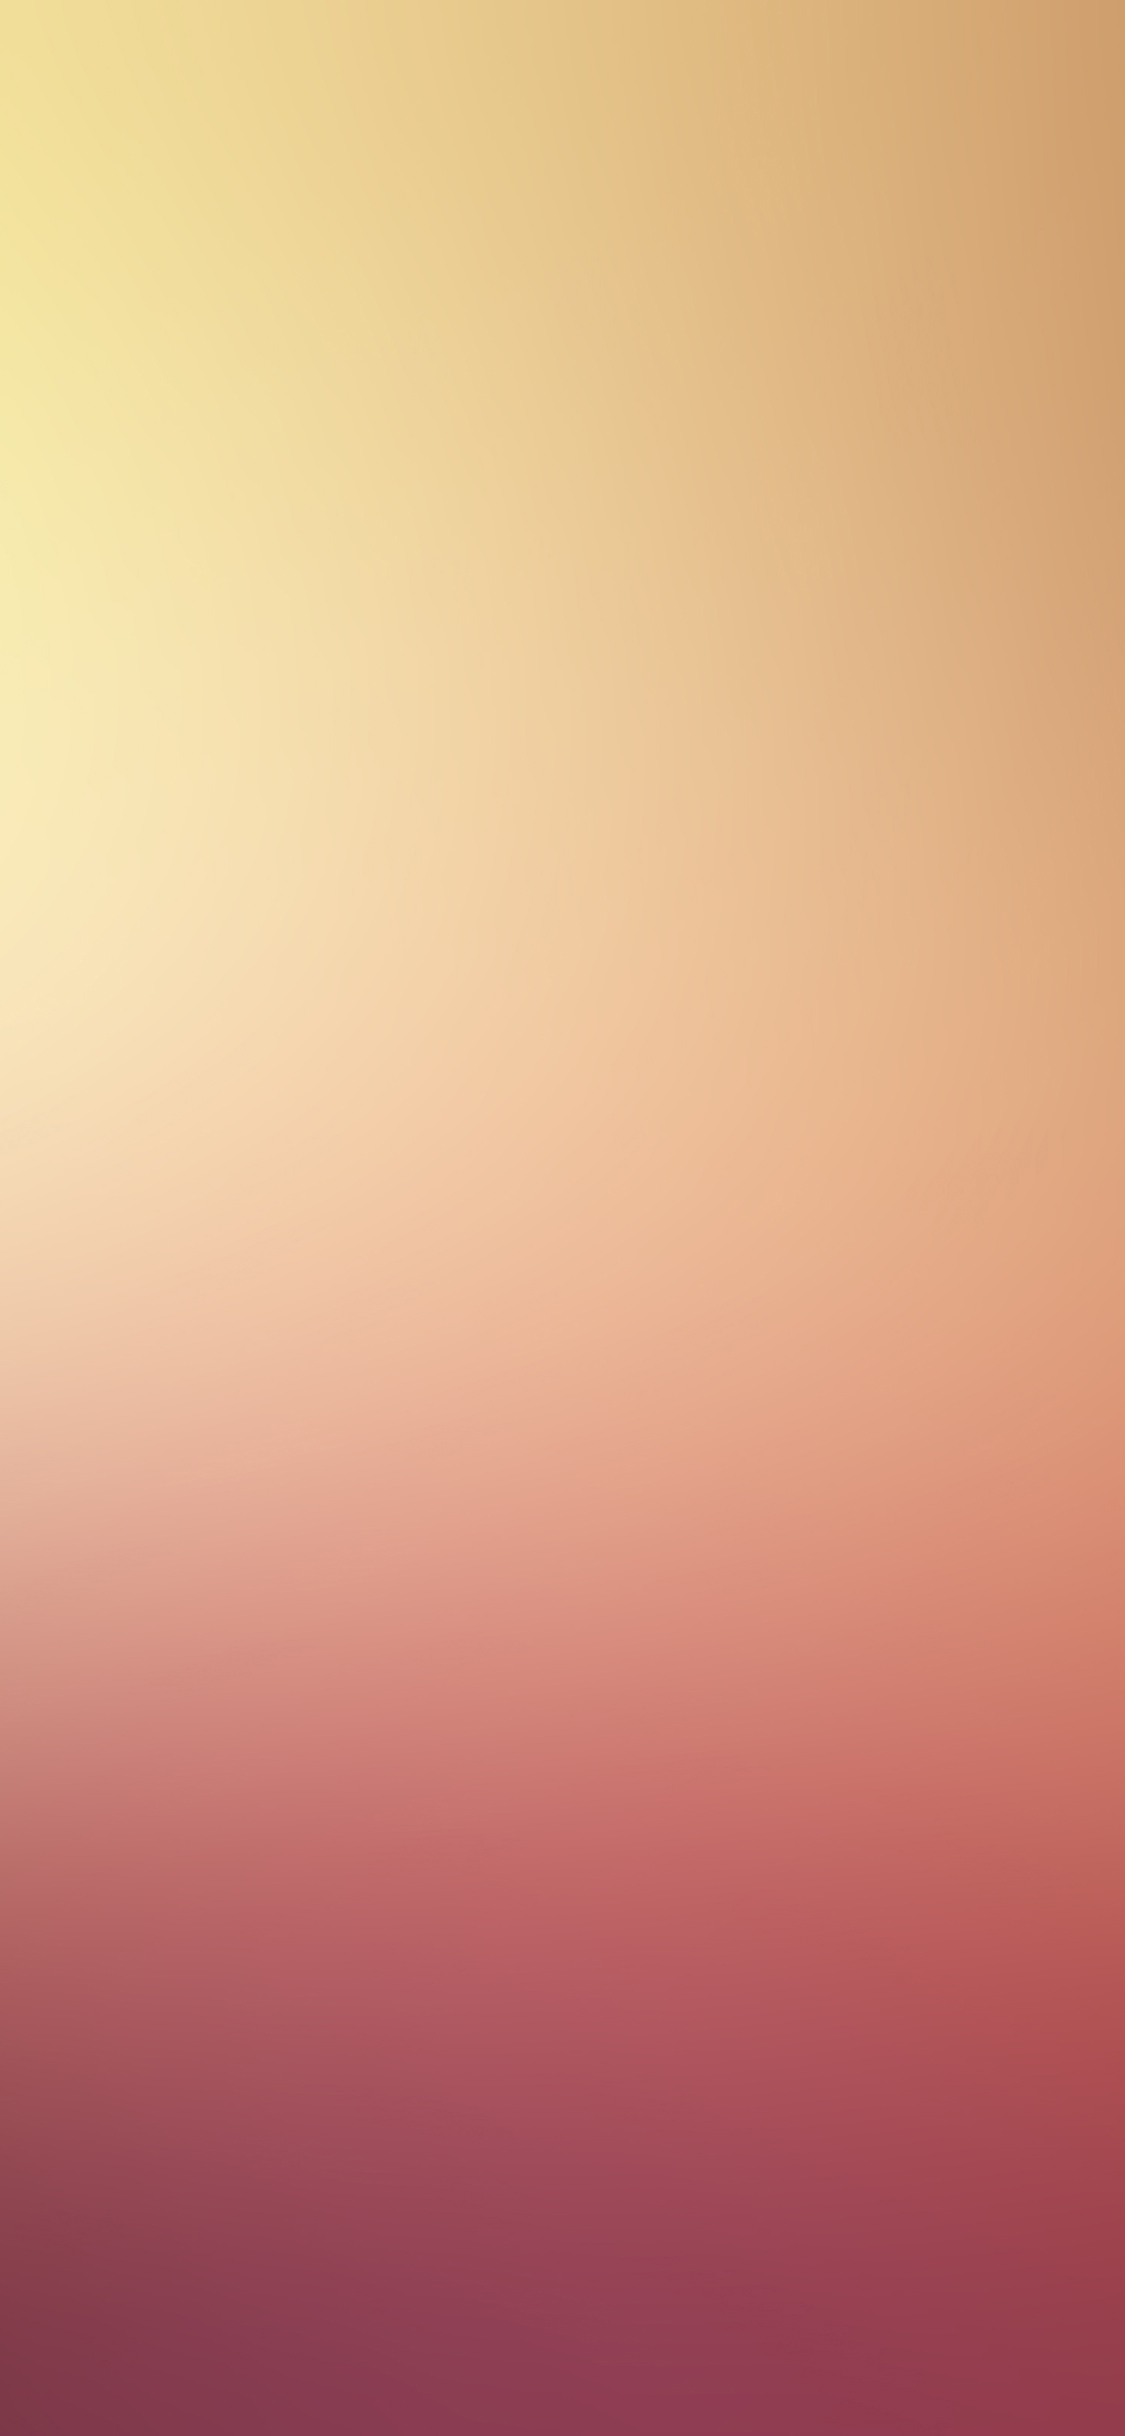 iPhoneXpapers.com-Apple-iPhone-wallpaper-sd59-shiny-morning-sunlight-gradation-blur